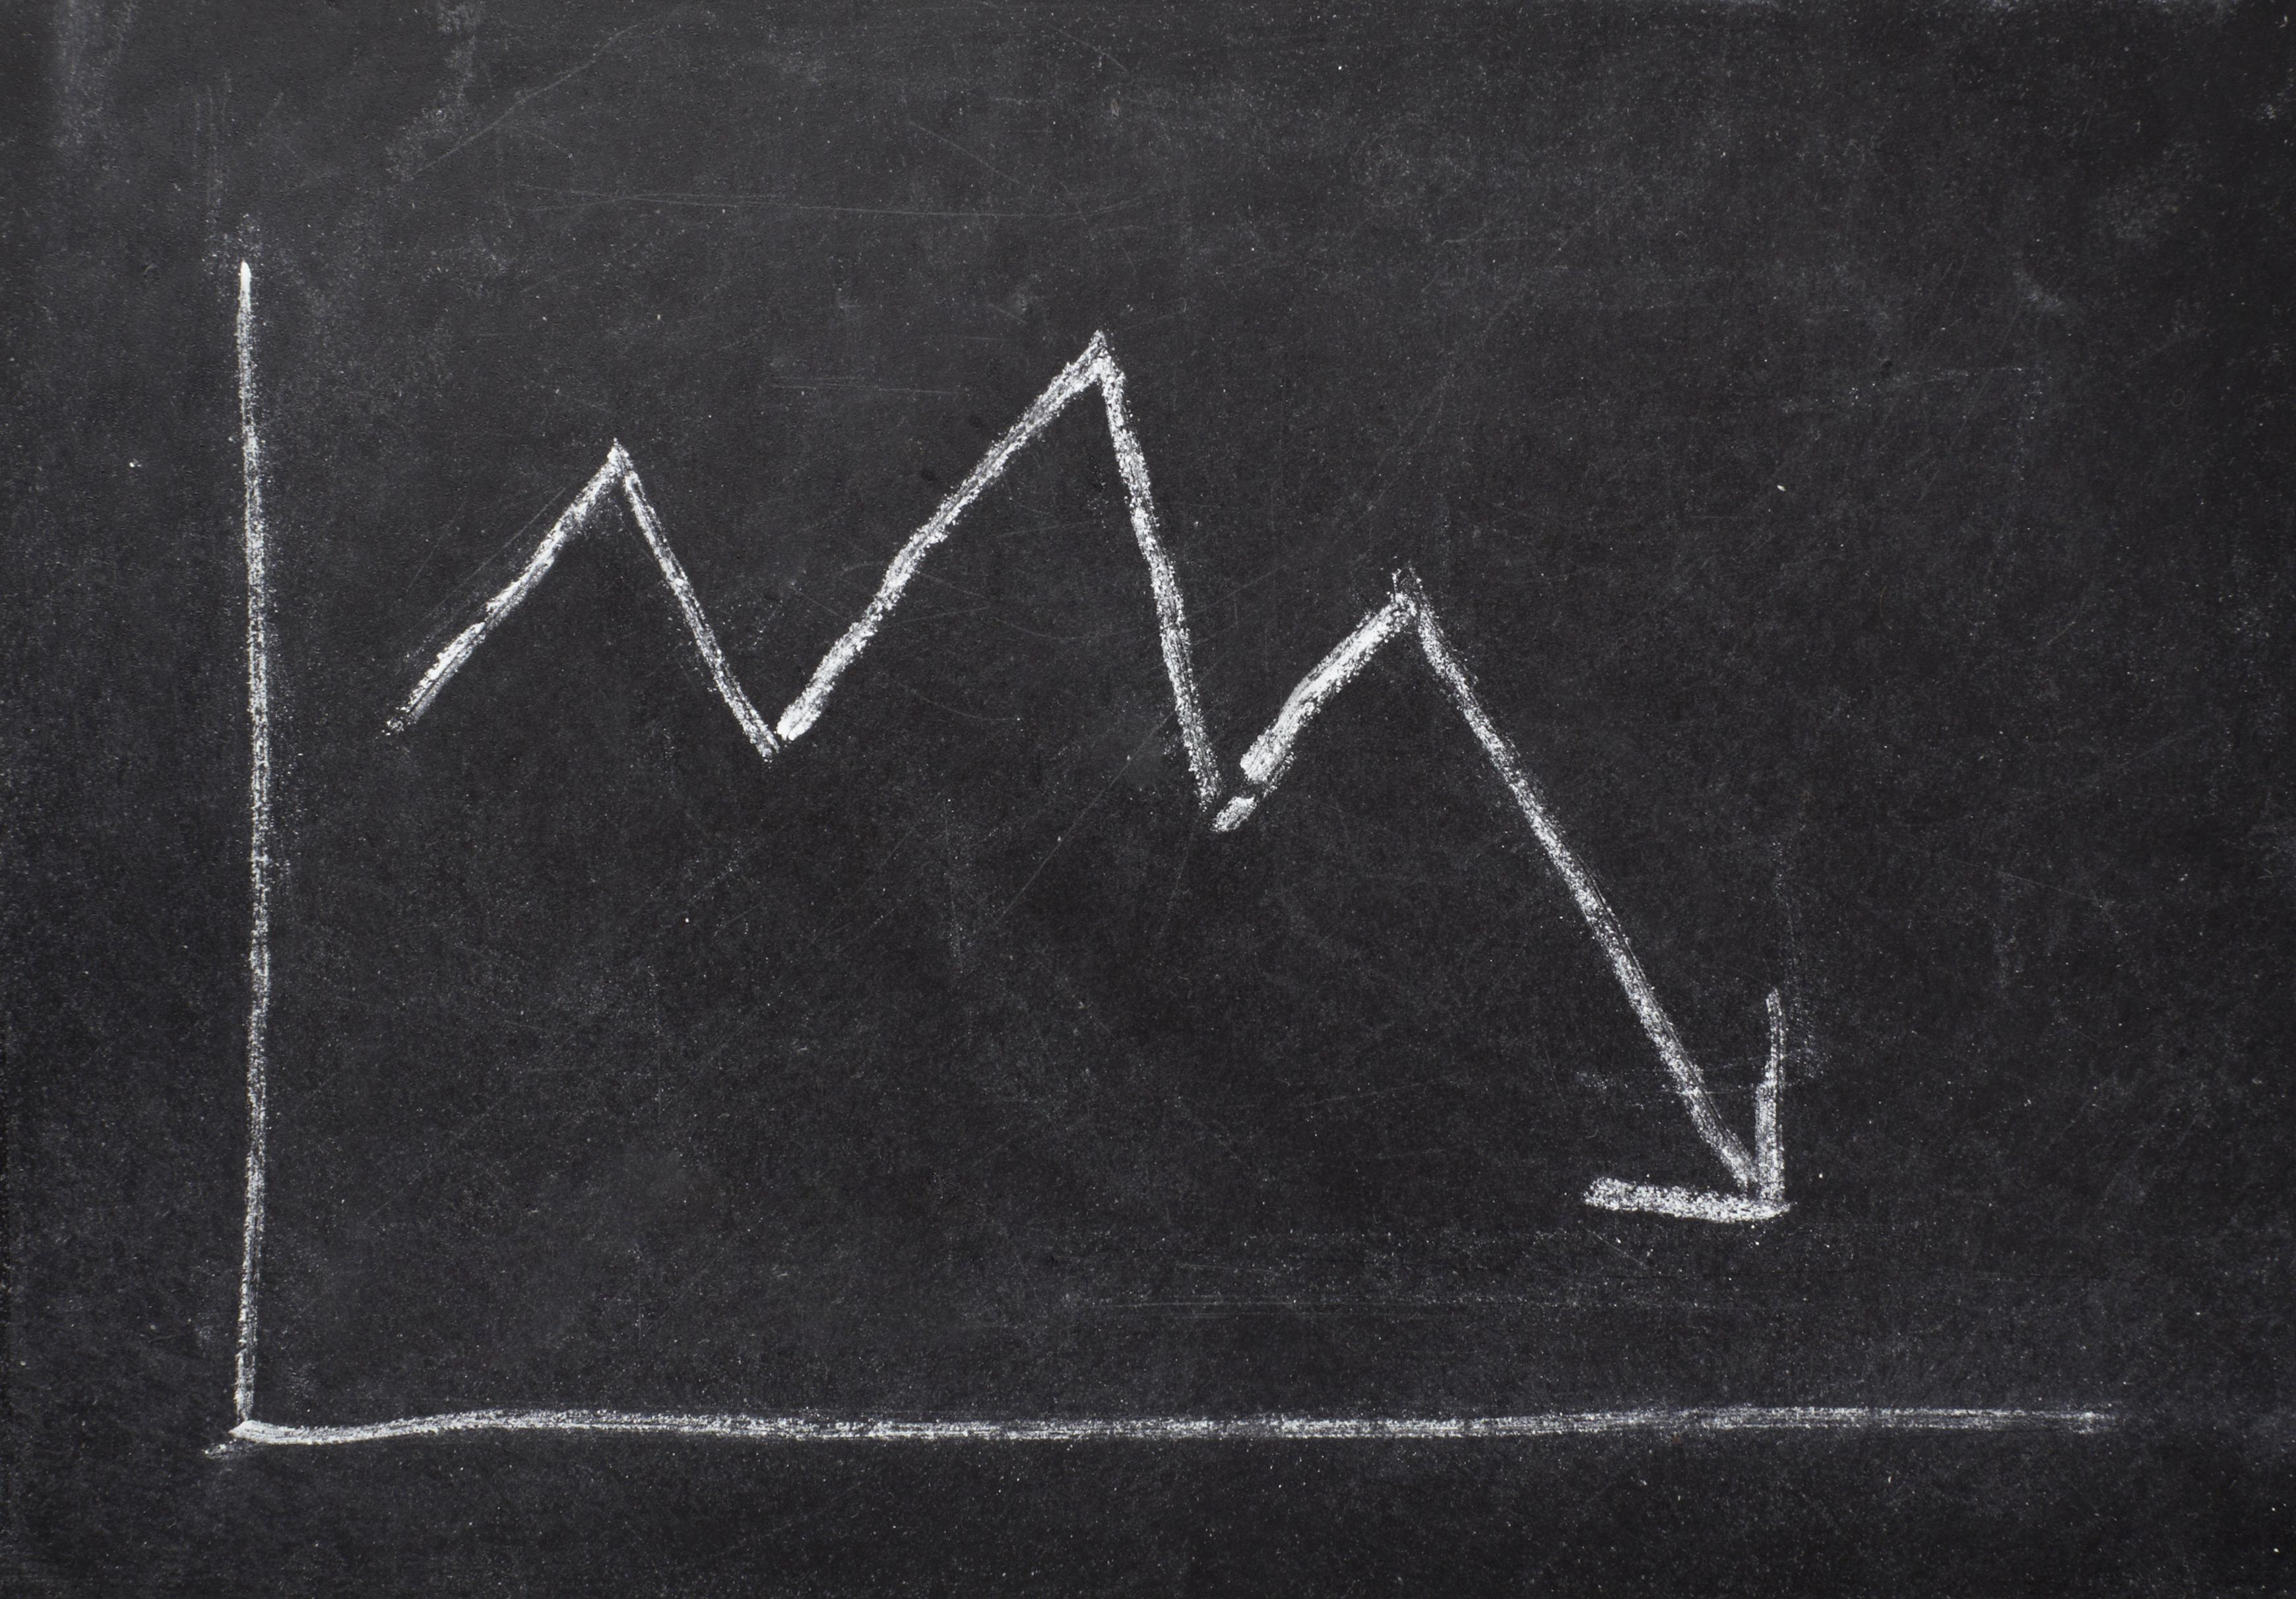 A chalkboard sketch of a chart showing a white arrow falling.